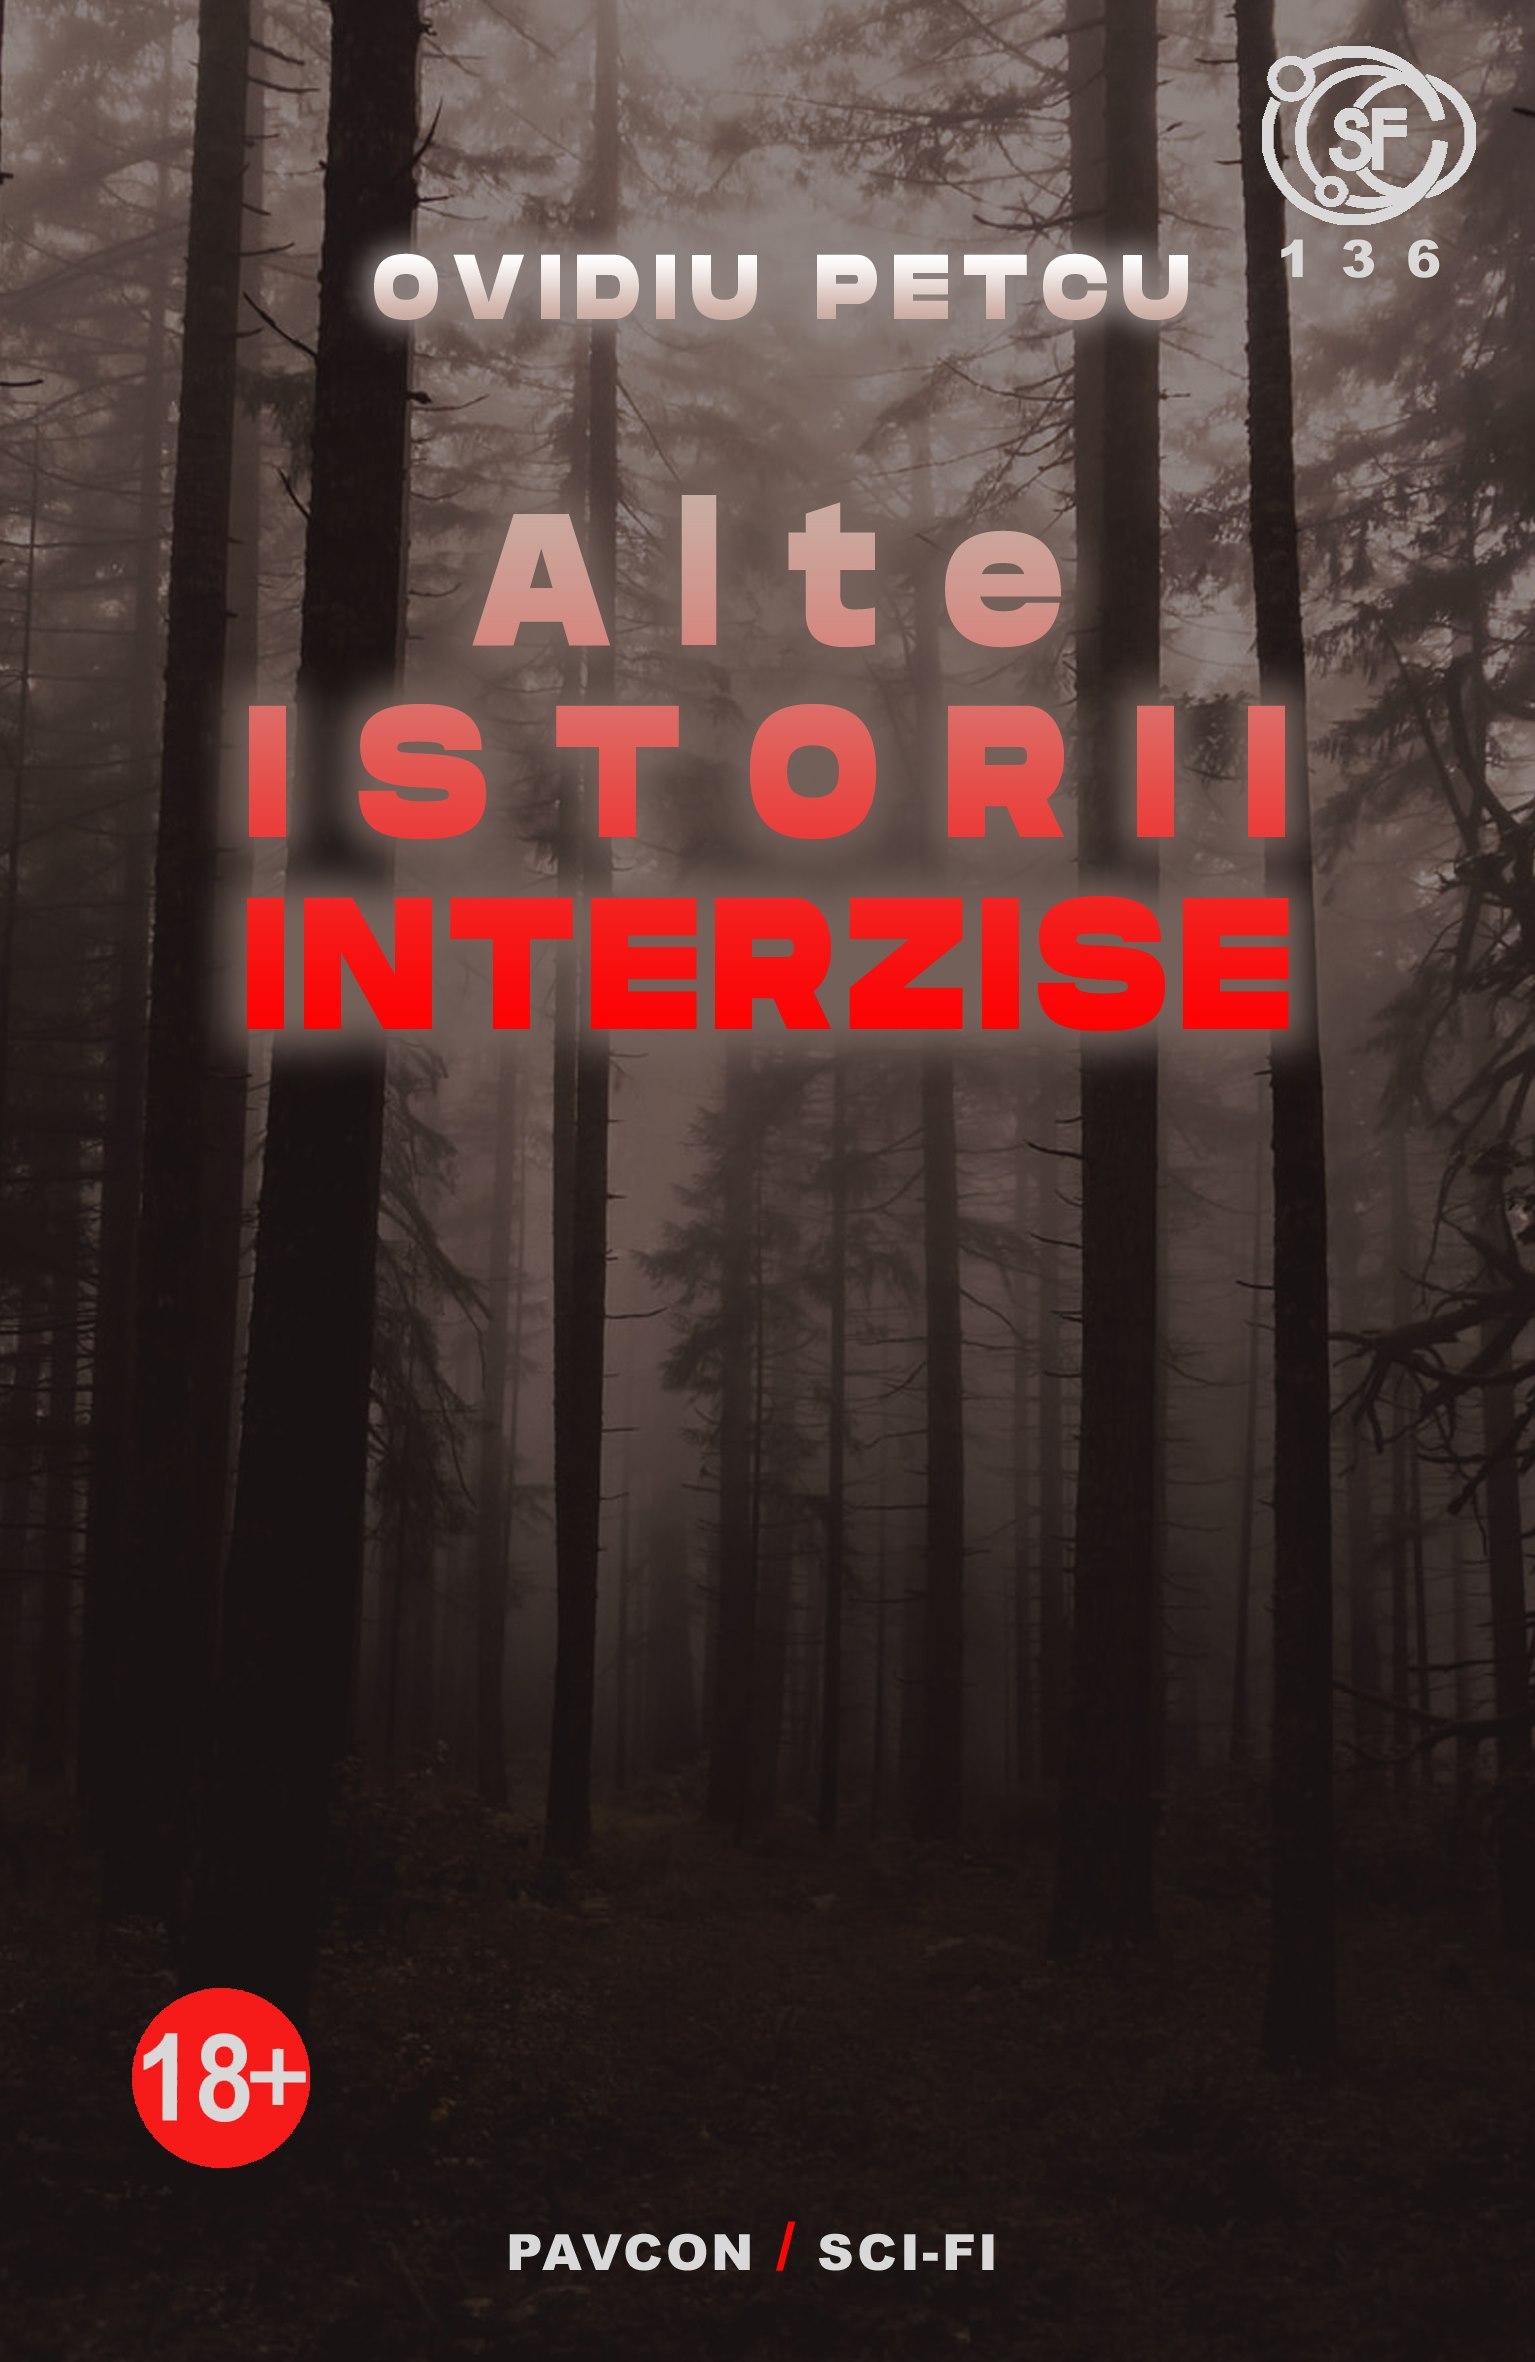 Imagine Alte Istorii Interzise - Ovidiu Petcu